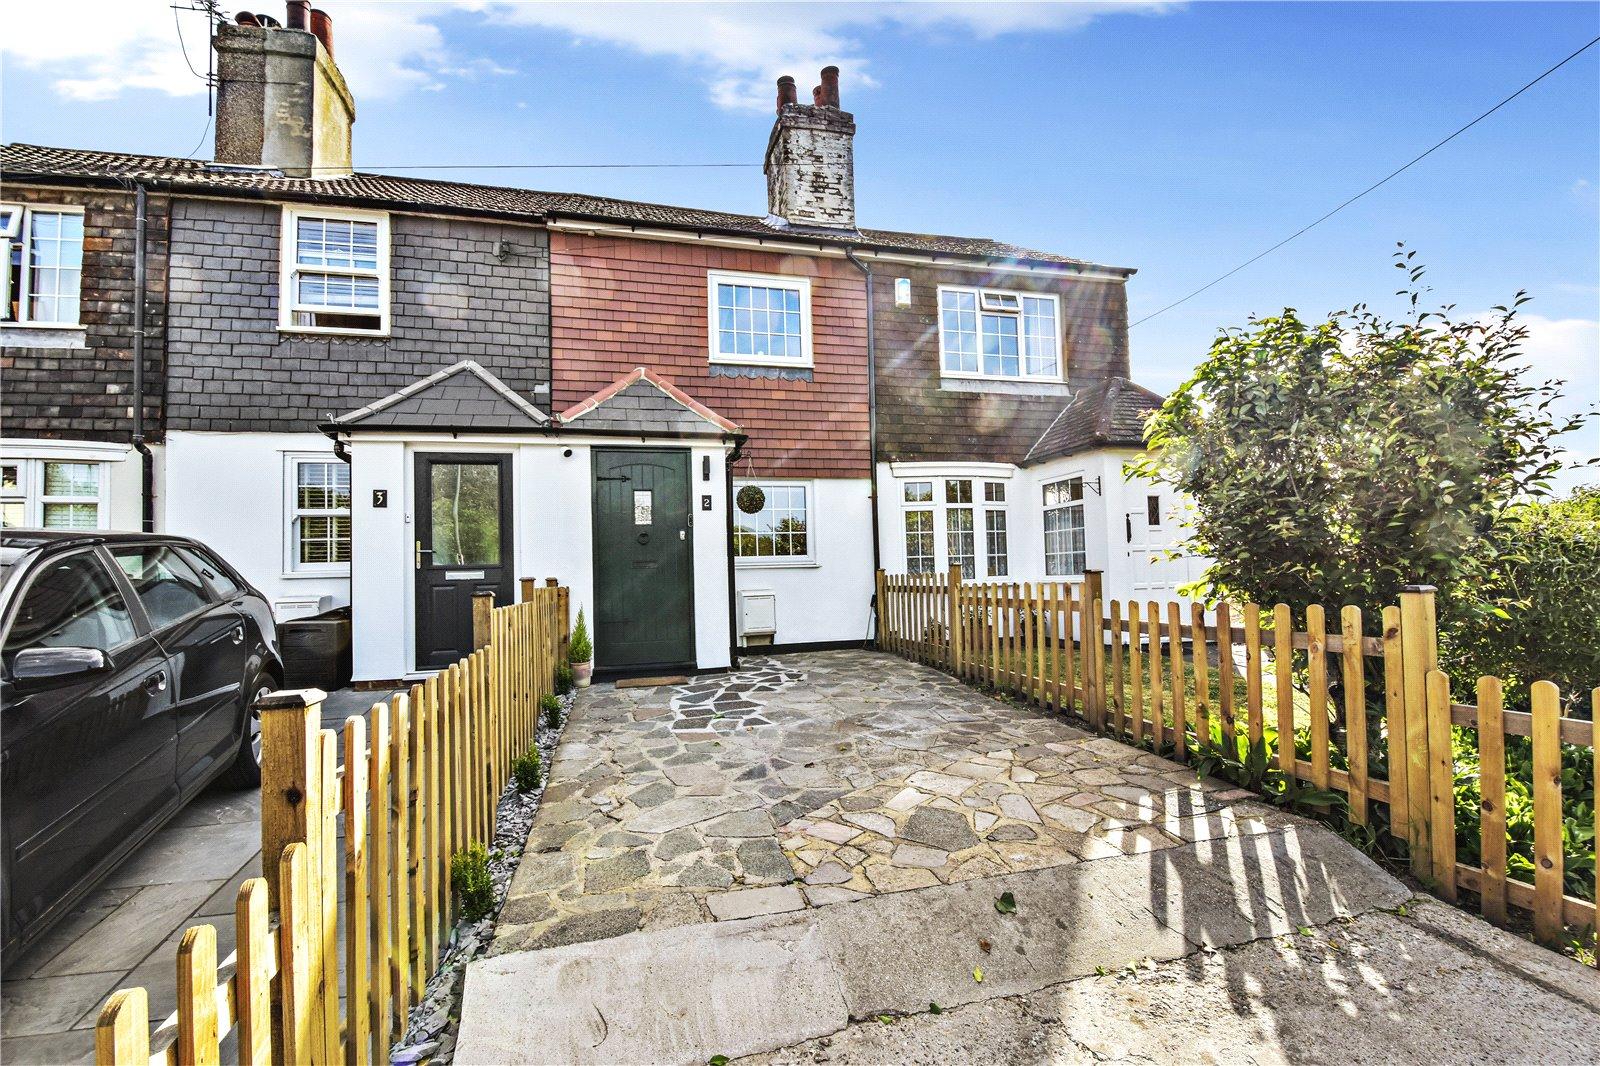 Claremont Cottages, Hawley Road, Dartford, Kent, DA1